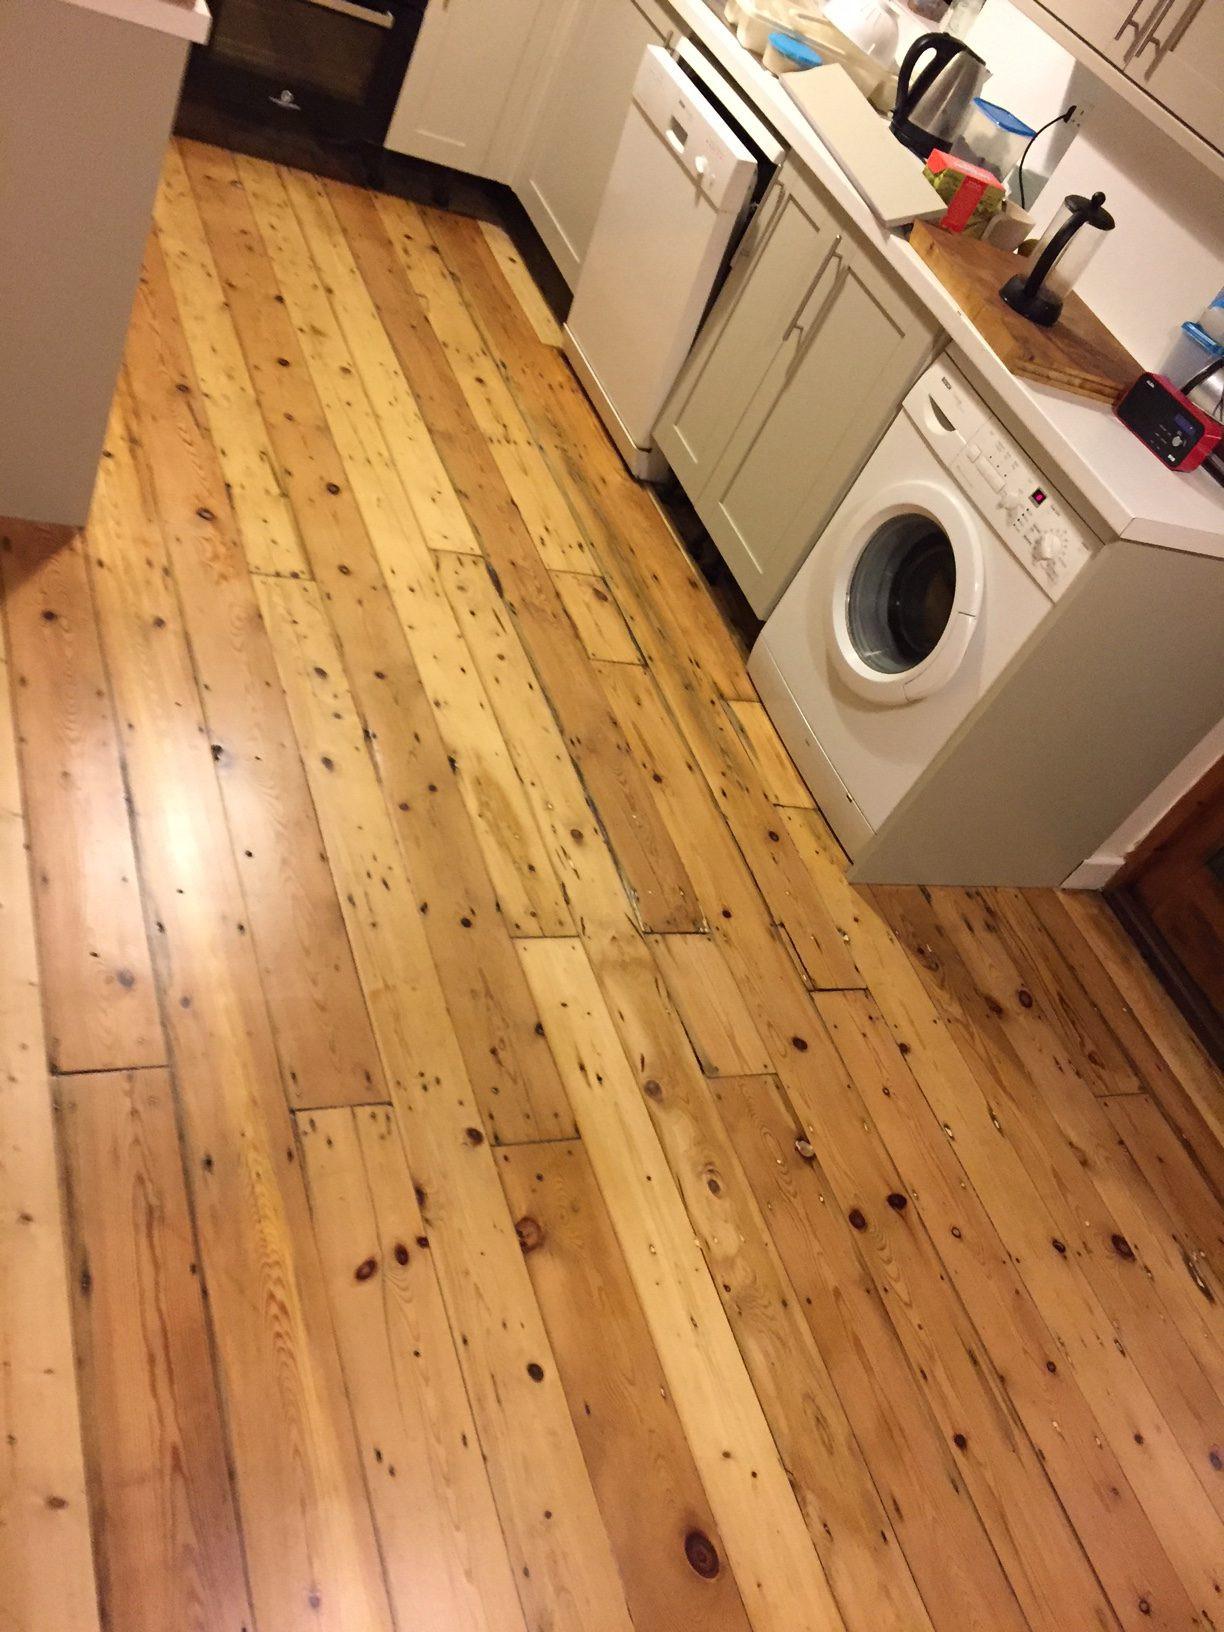 refinishing hardwood floors light to dark of refinishing old hardwood floors transition from tile to wood floors within refinishing old hardwood floors gallery priory wood floor restoration